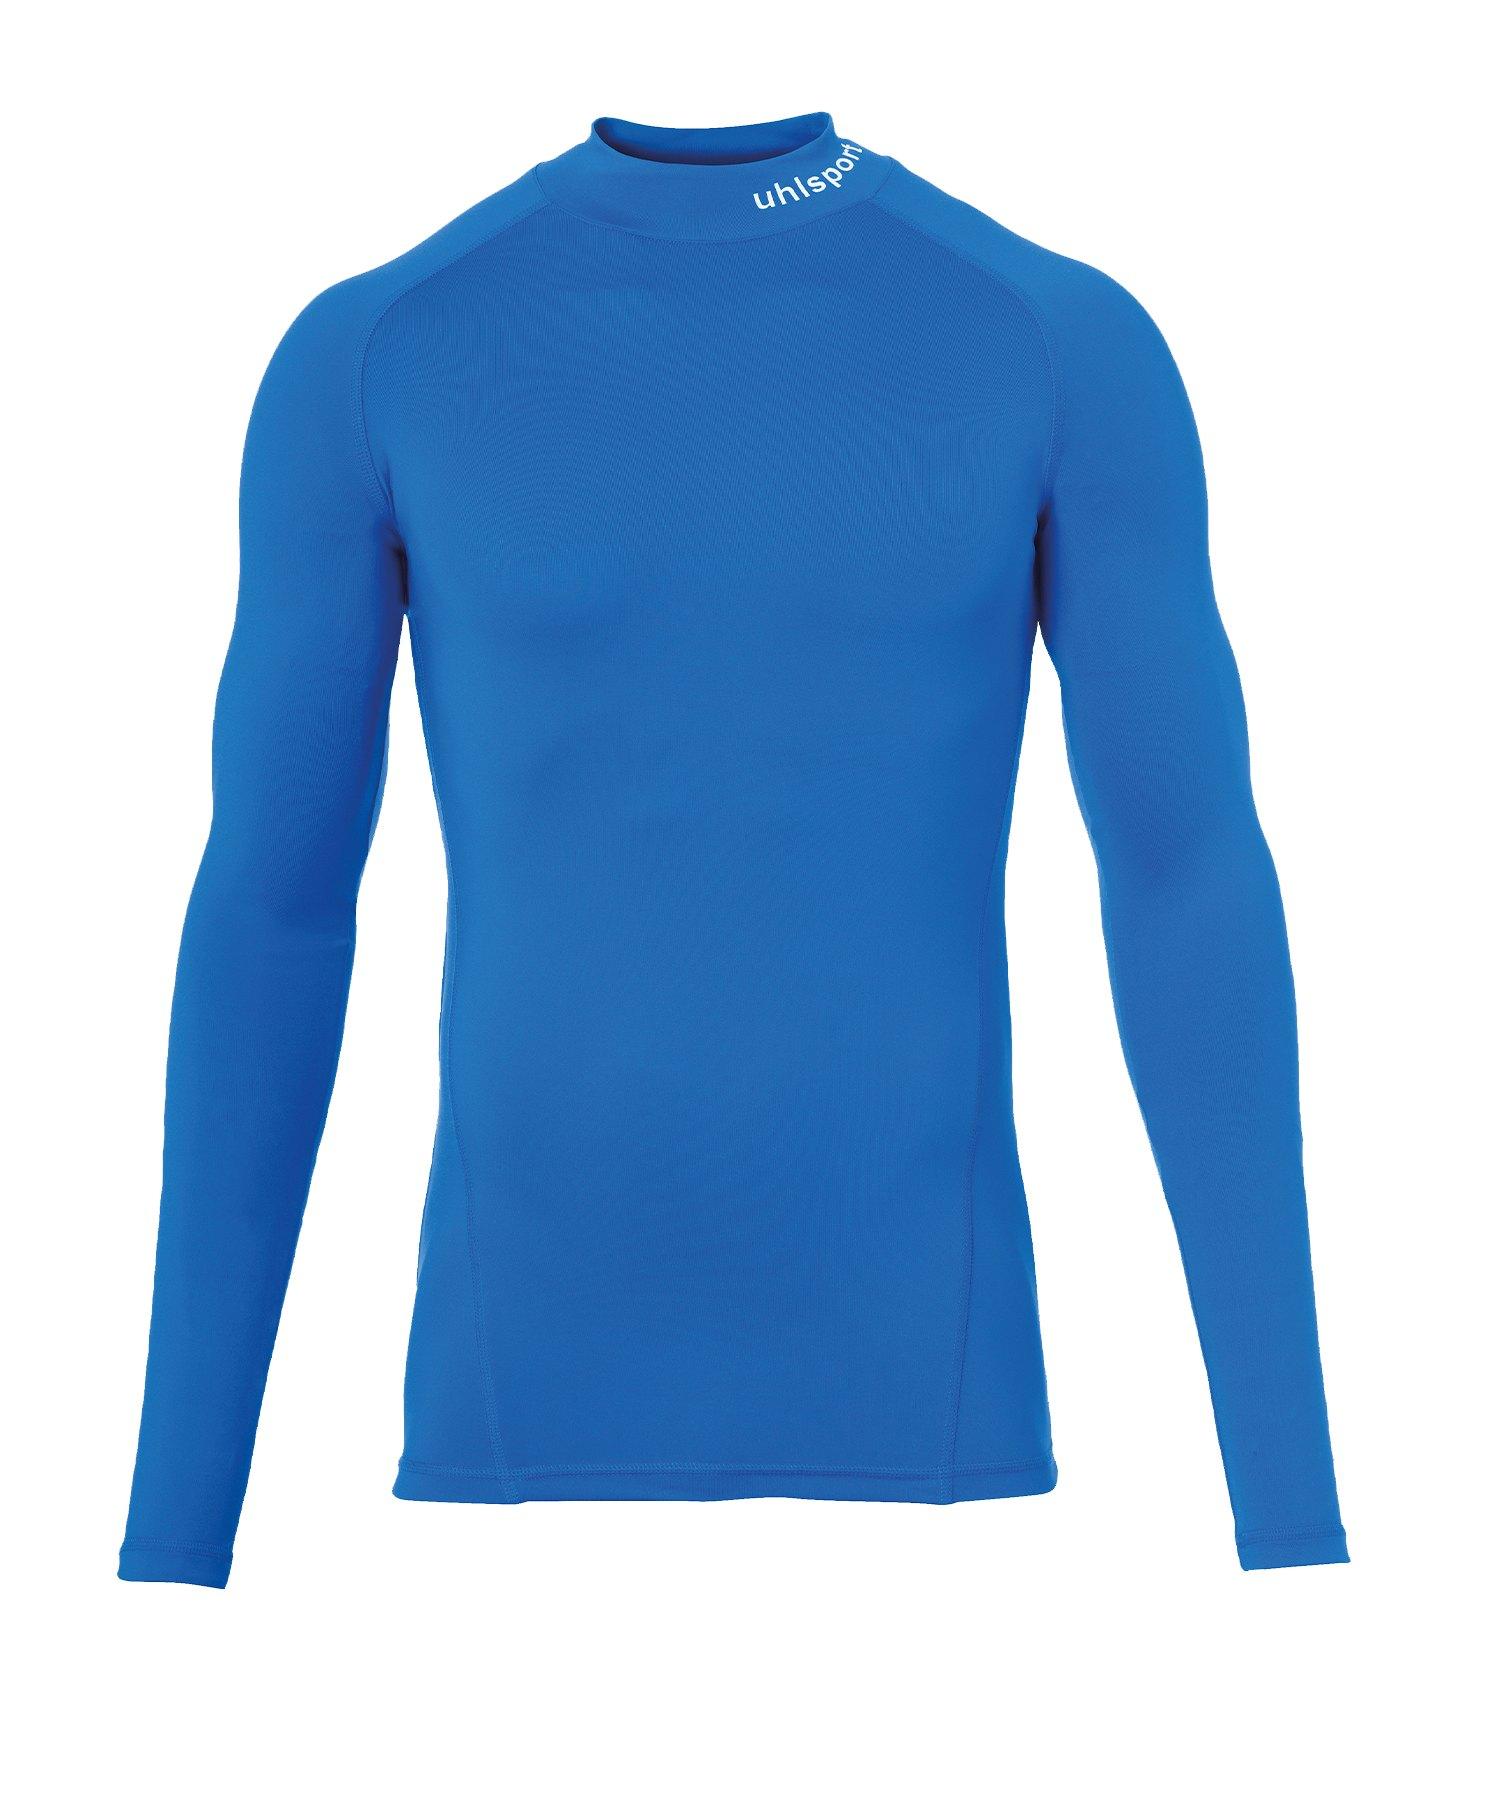 Uhlsport Pro Baselayer Turtleneck Kids Blau F03 - Blau